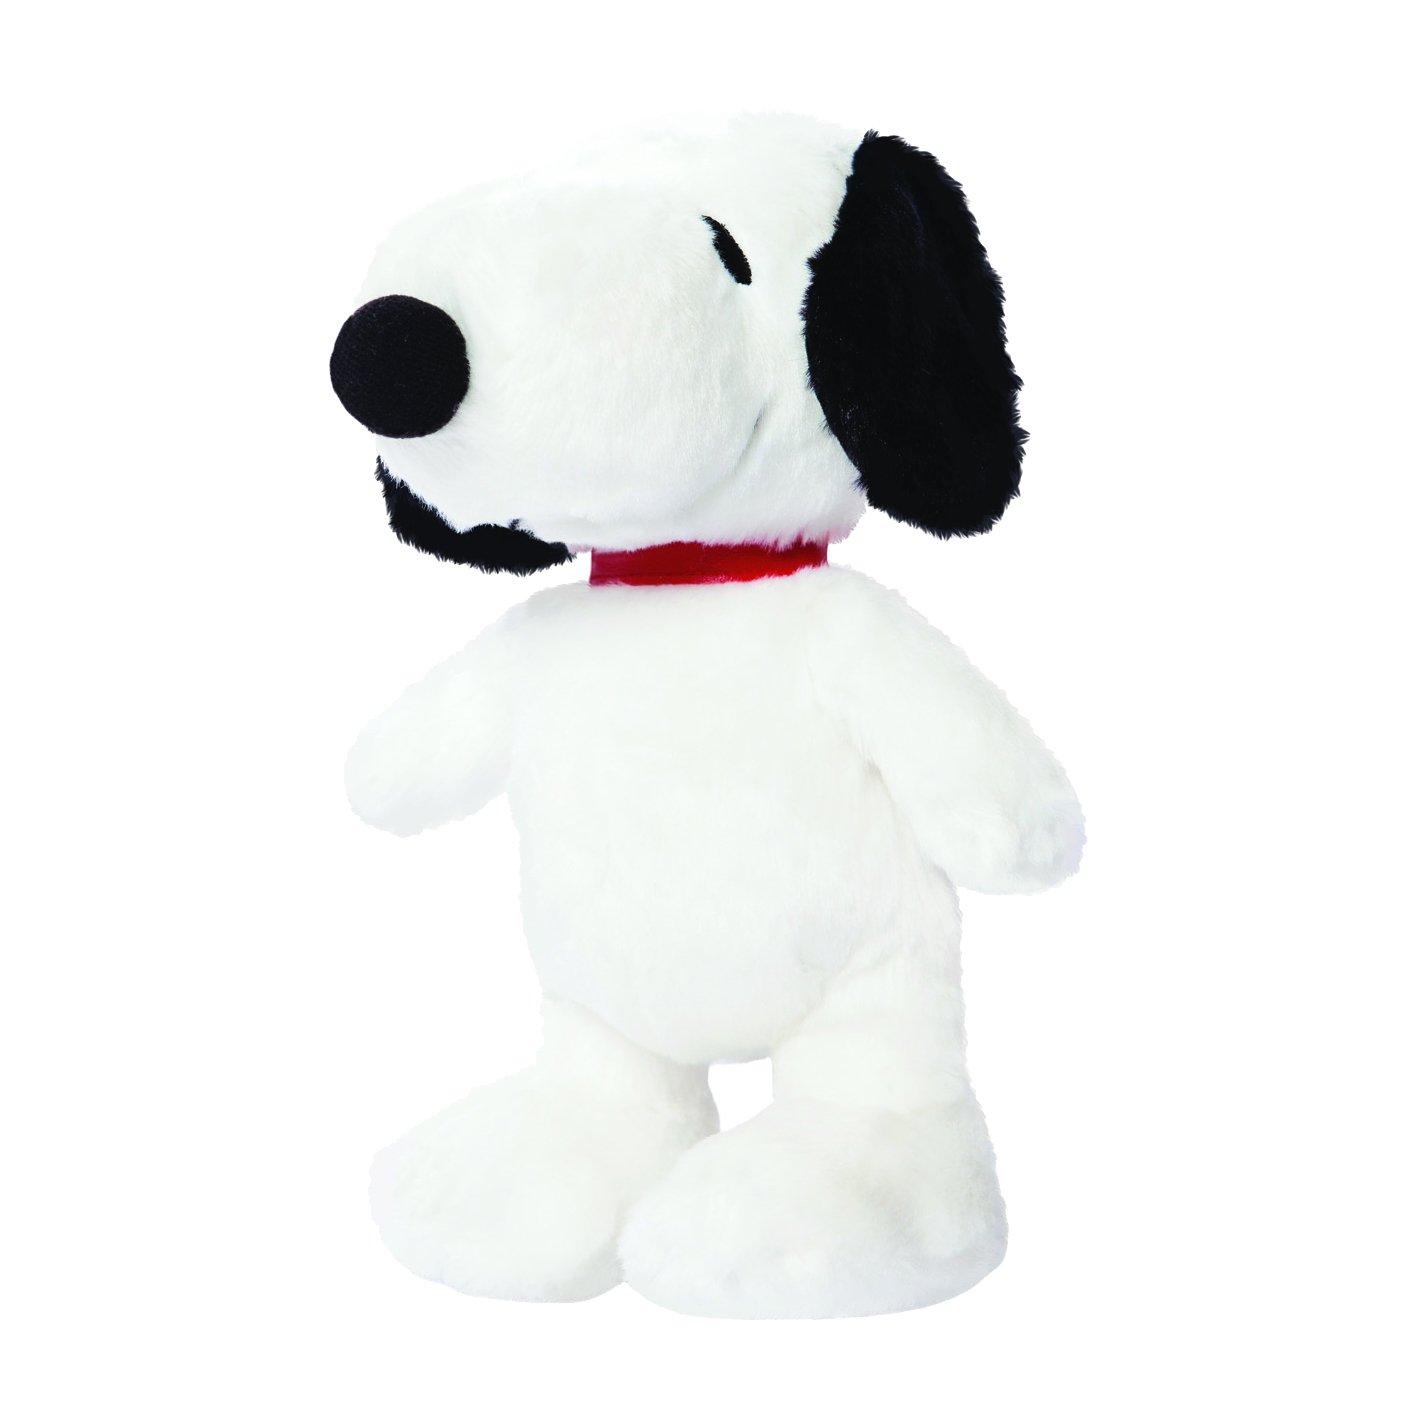 Peanuts Snoopy 7.5In Plush